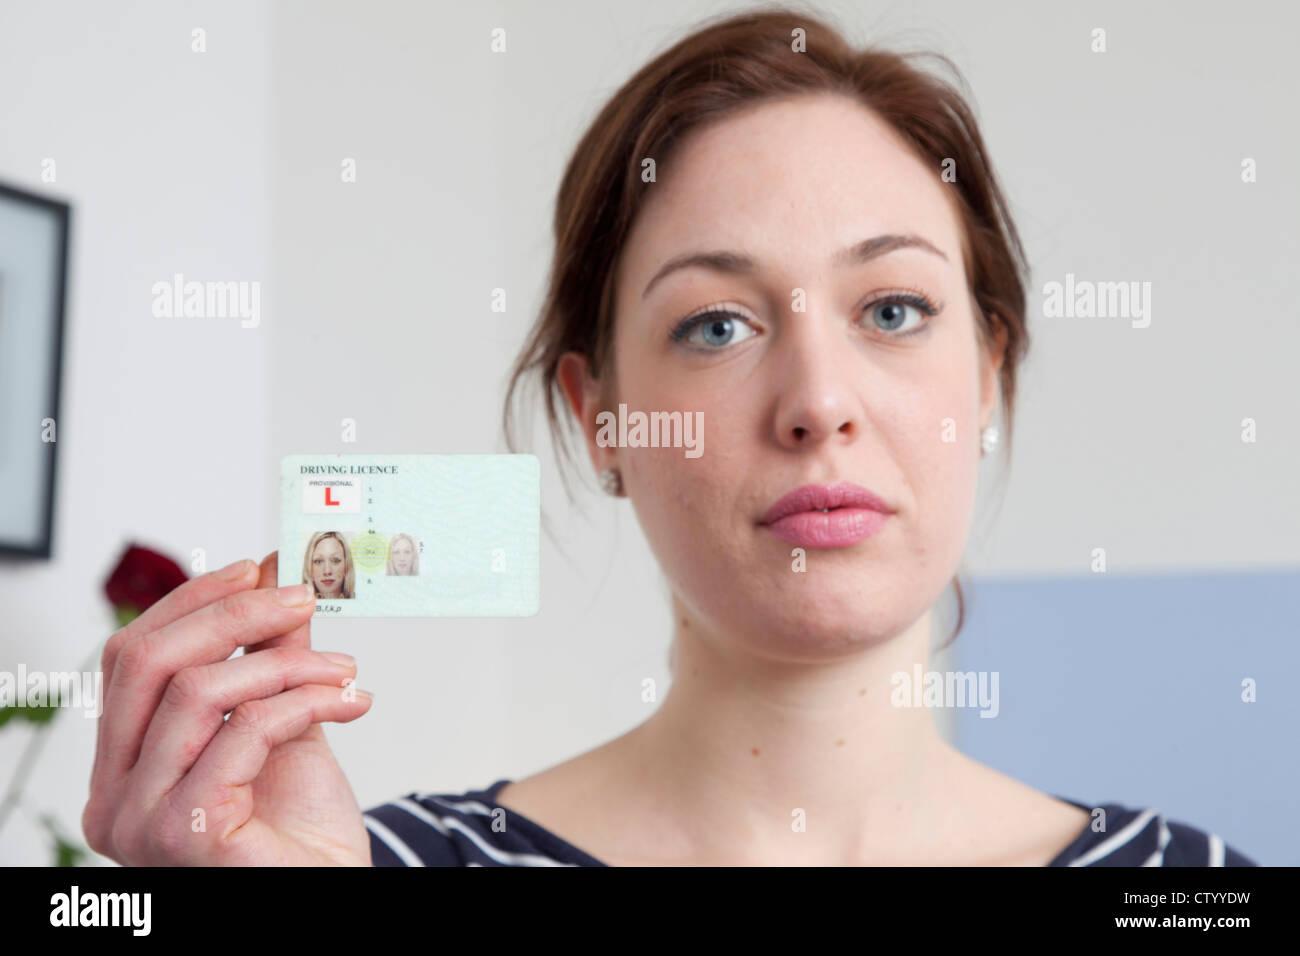 woman holding identification card stock photo 49786741 alamy